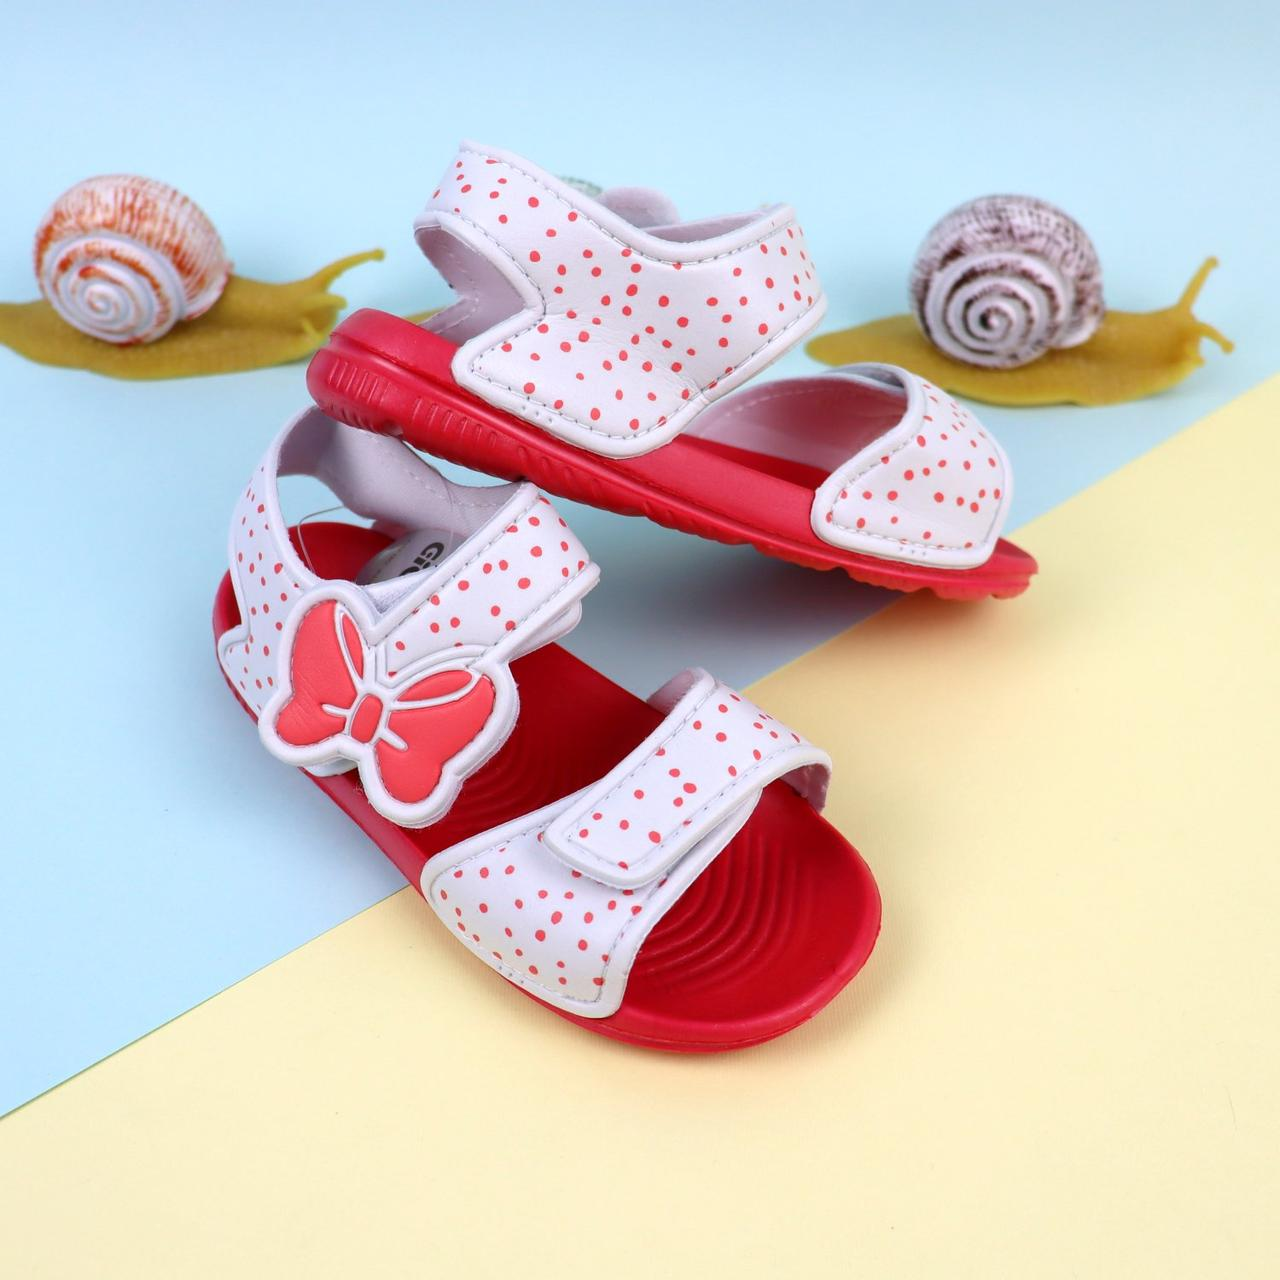 Сандалии для девочки, пляжная обувь тм Giolan размер 29,30,31,32,33,34,35